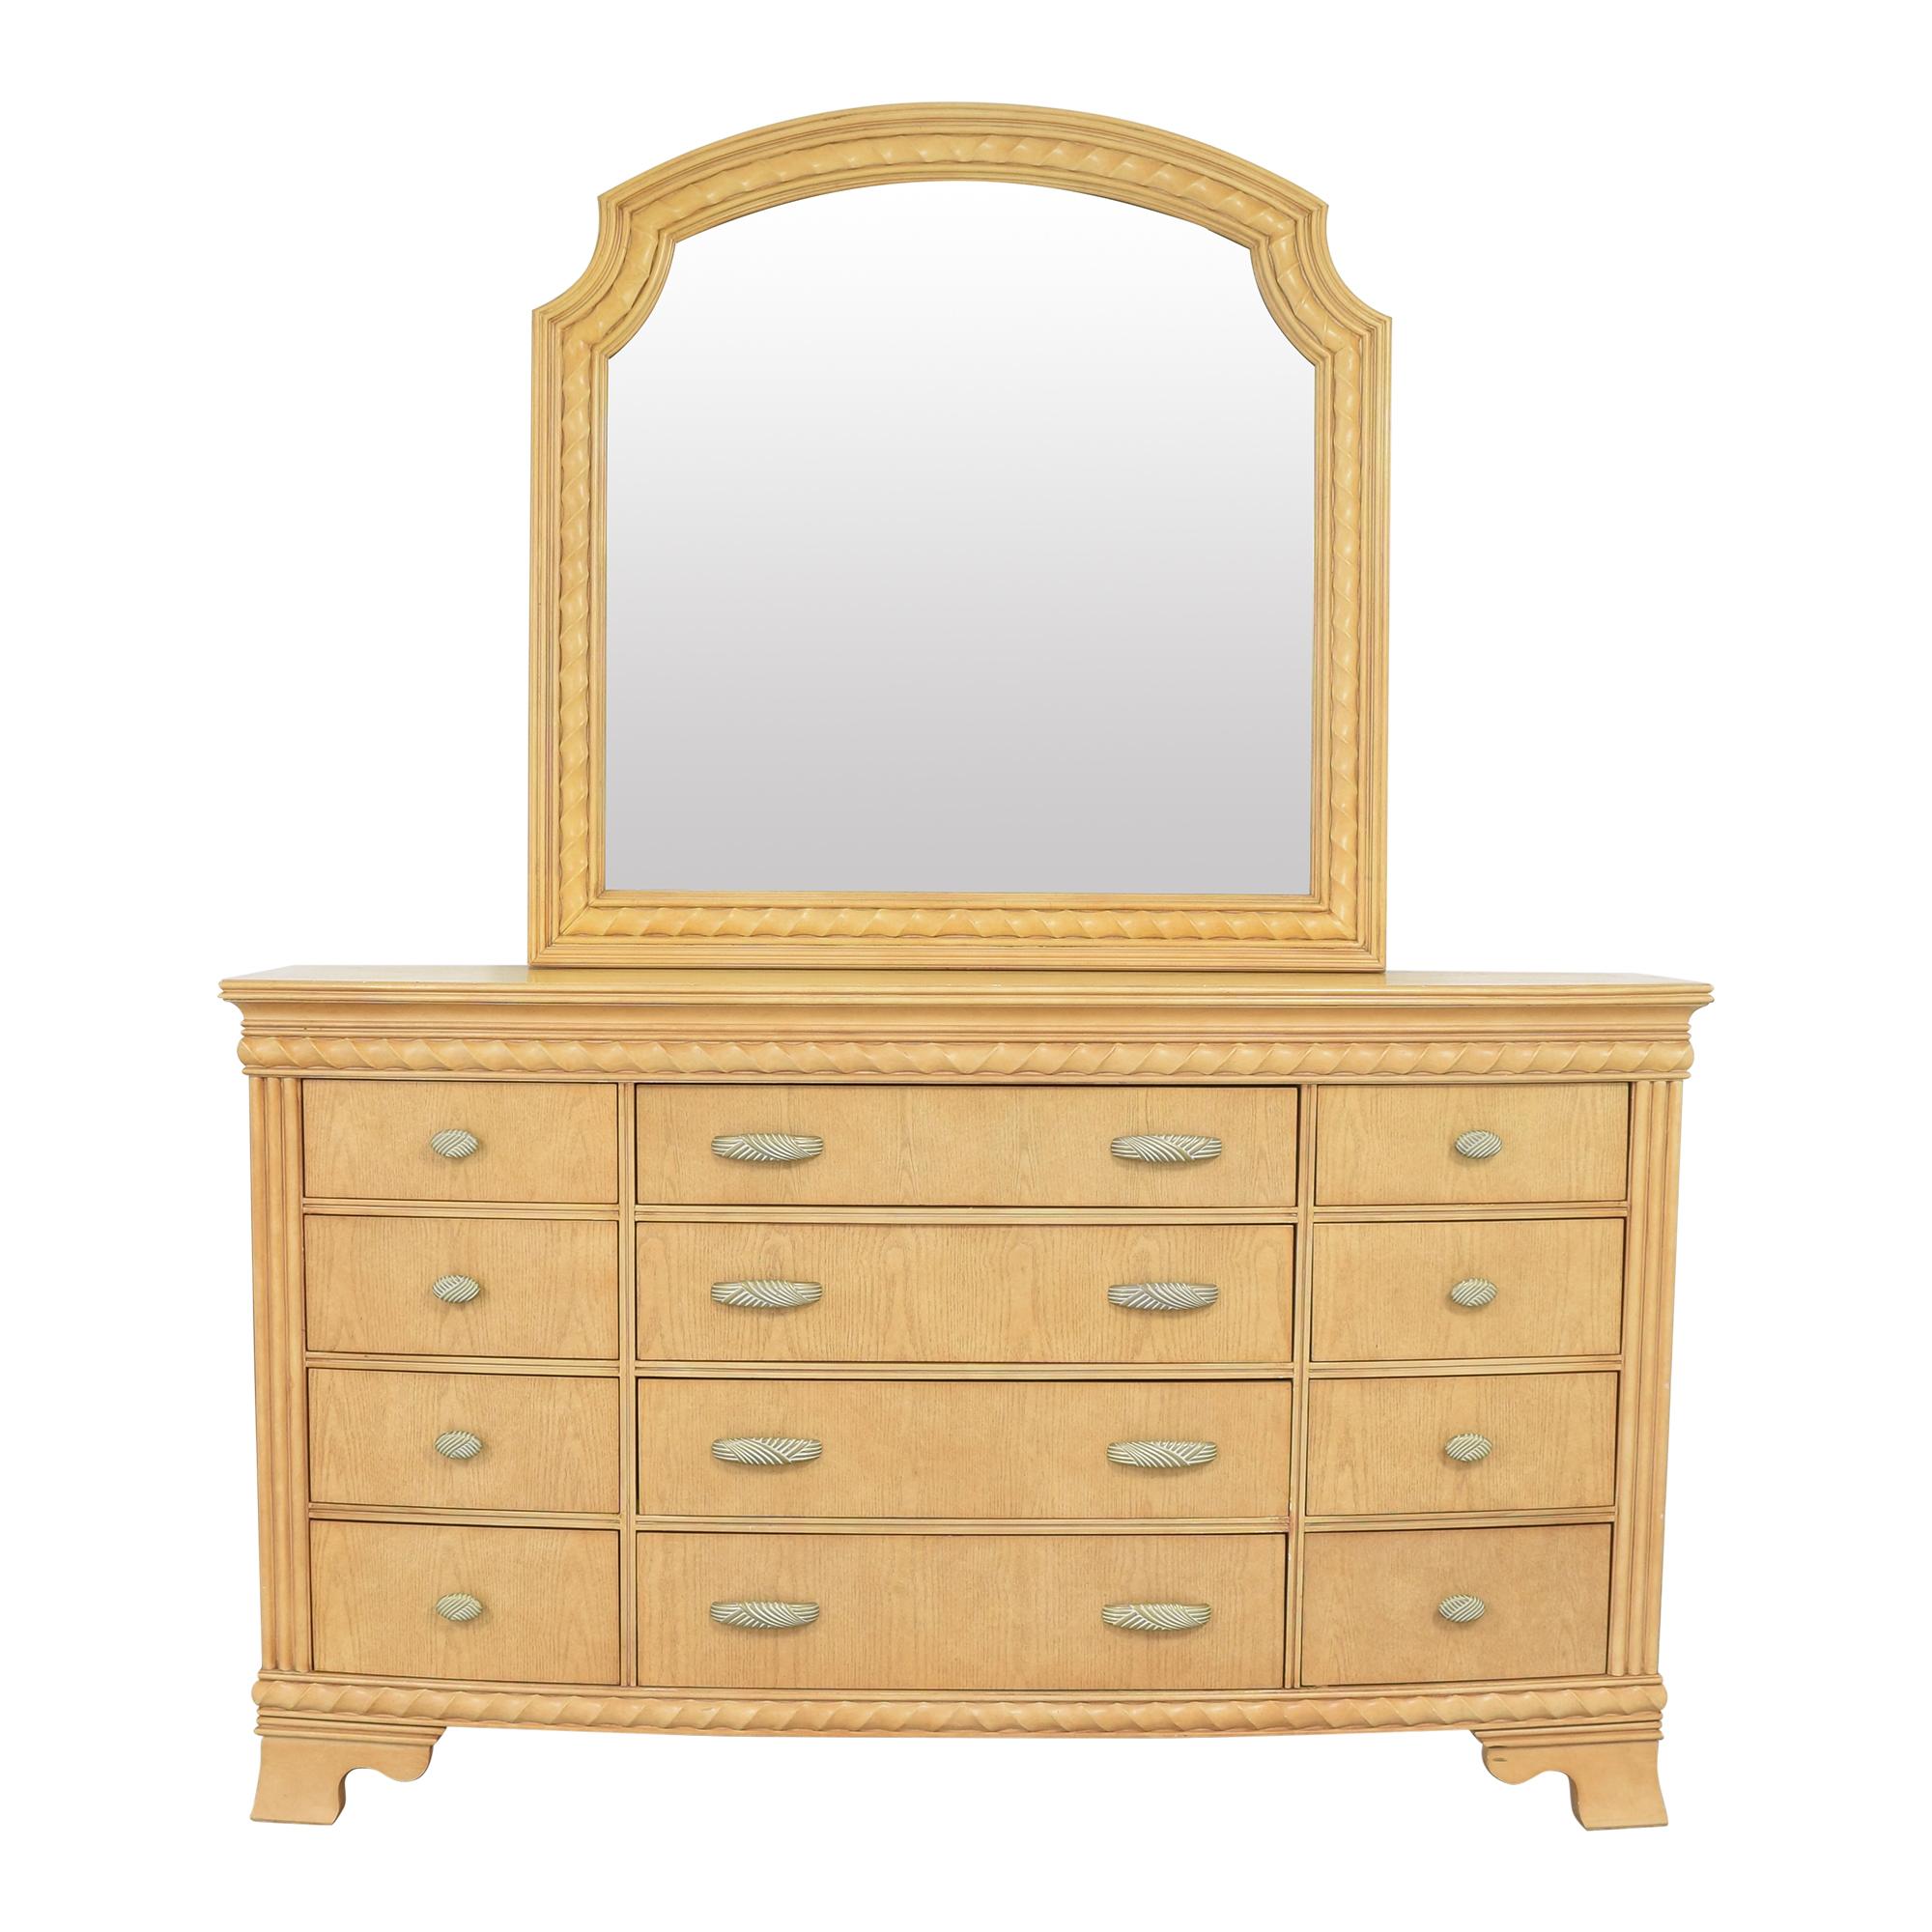 shop Raymour & Flanigan Triple Dresser with Mirror Raymour & Flanigan